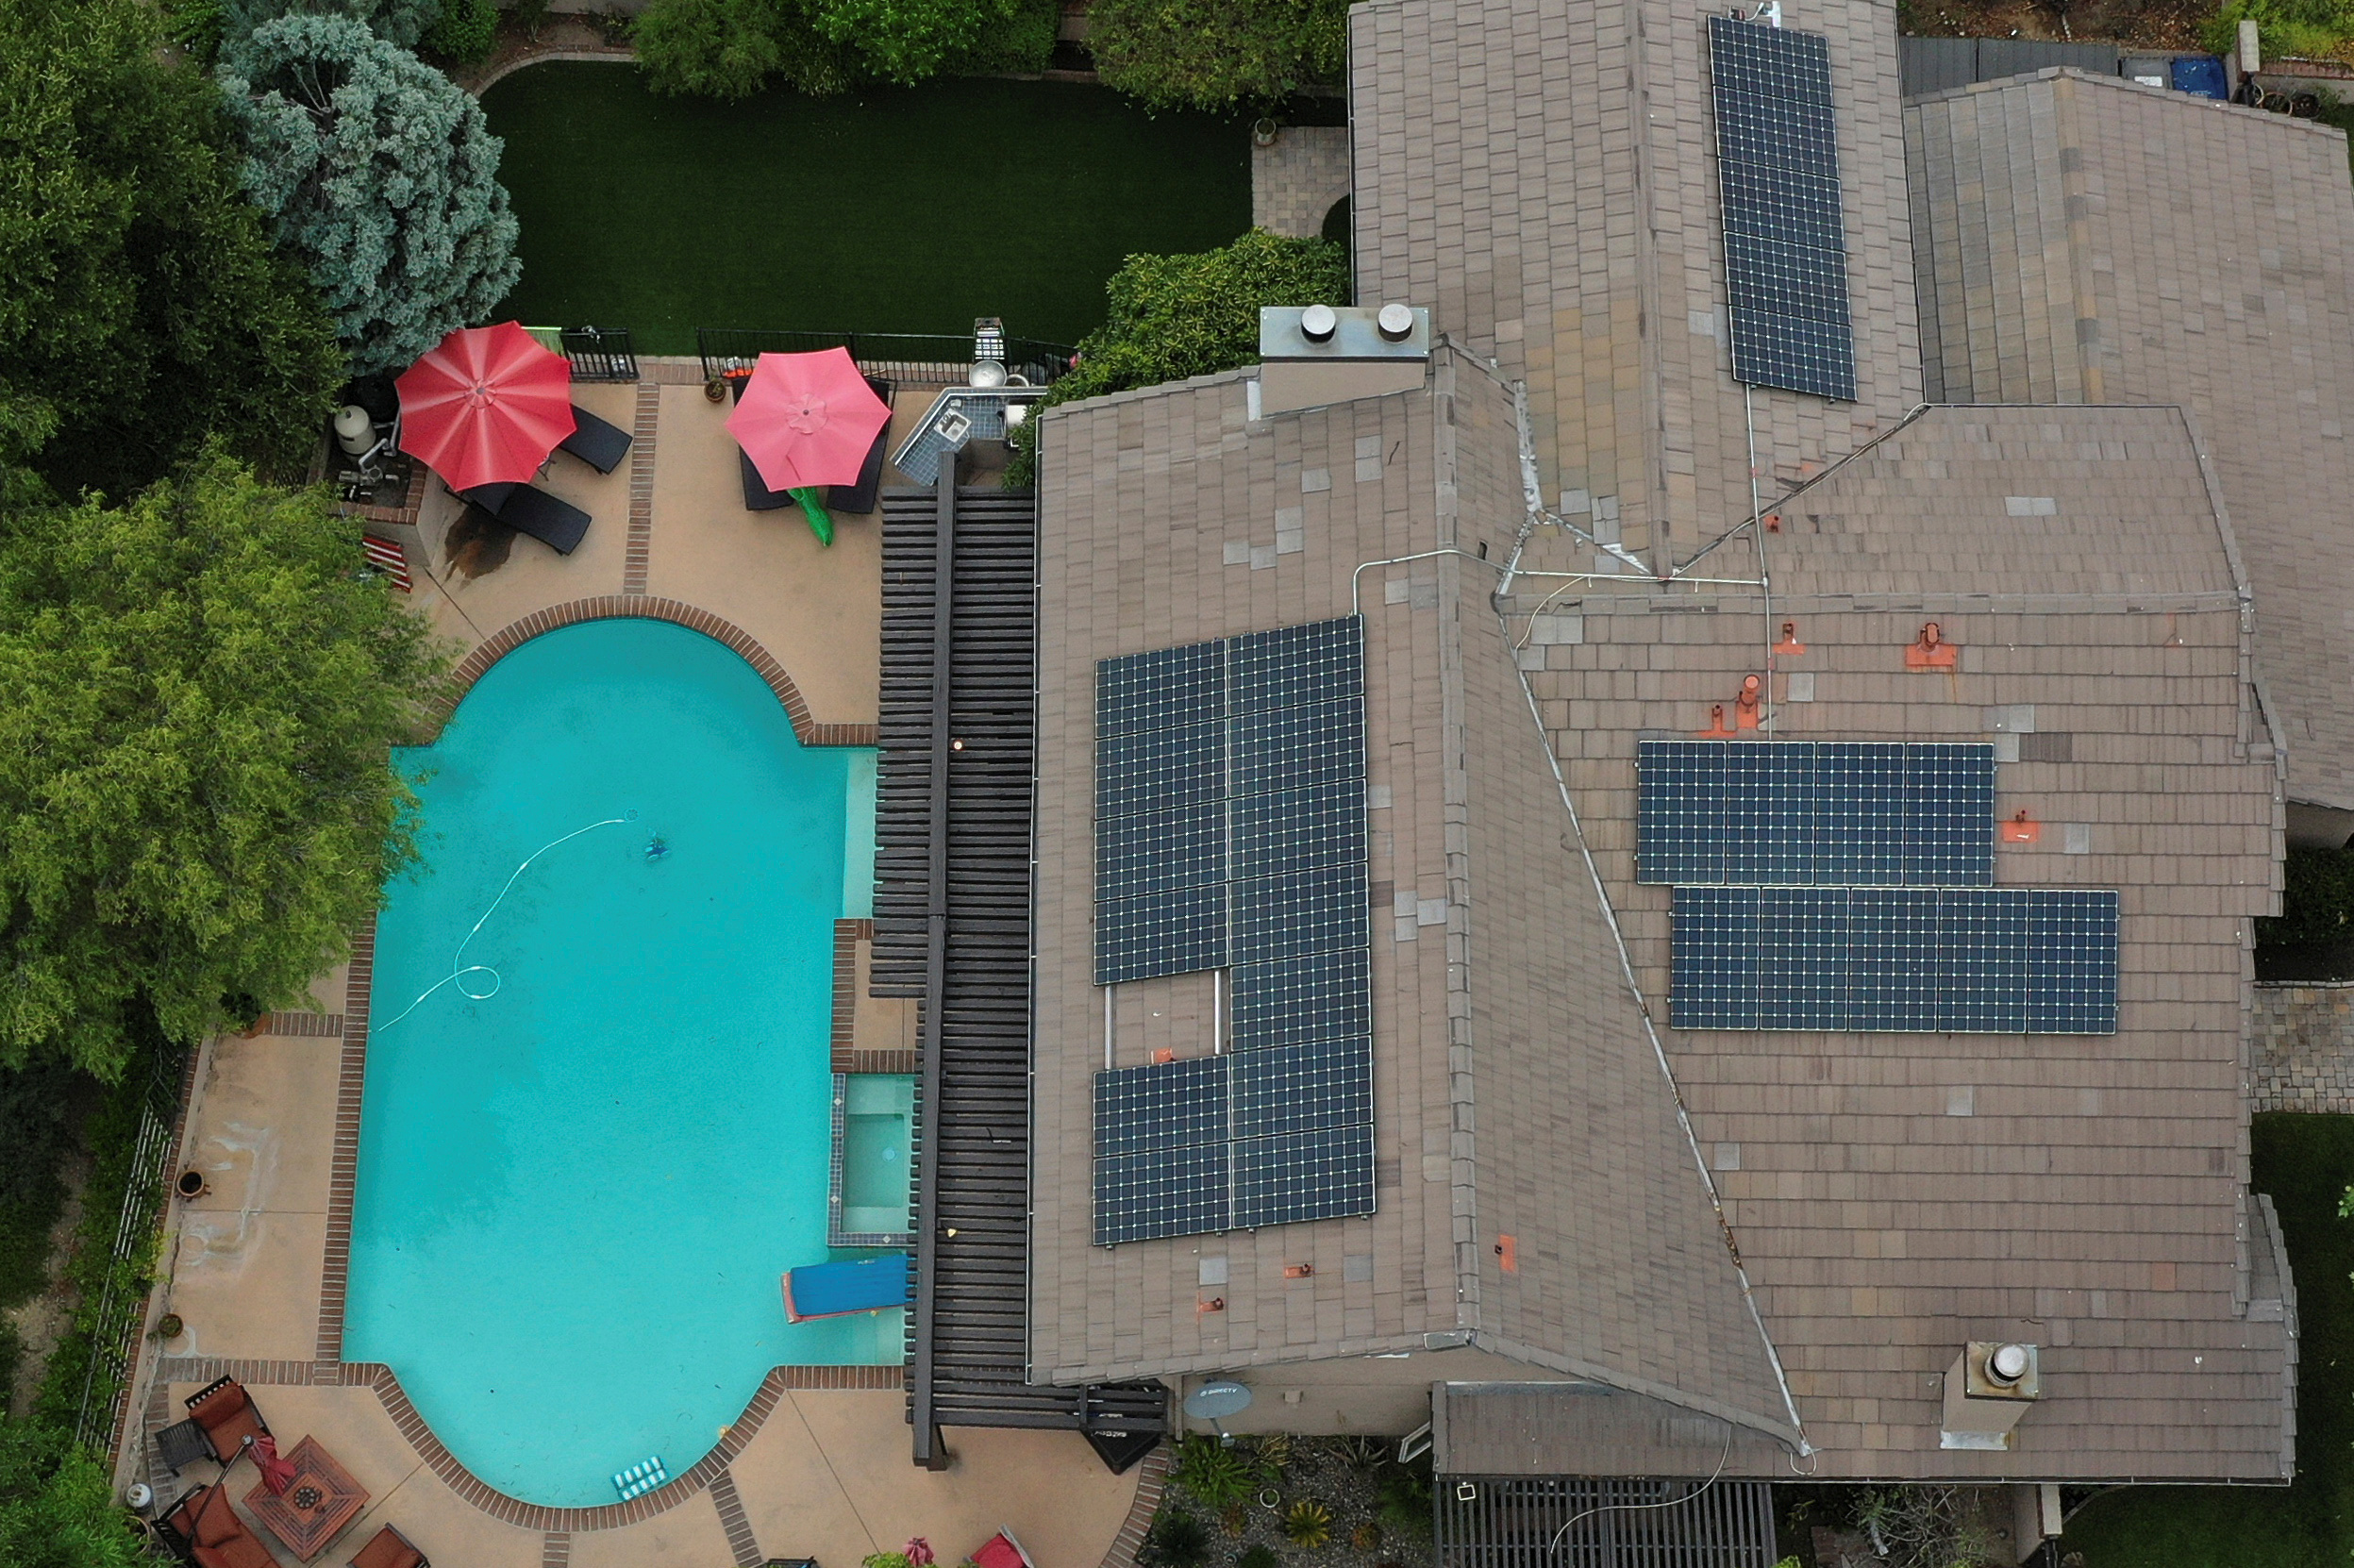 Solar panels are seen on rooftops amid the coronavirus disease (COVID-19) outbreak, in Santa Clarita, near Los Angeles, California, U.S., June 18, 2020.  REUTERS/Lucy Nicholson